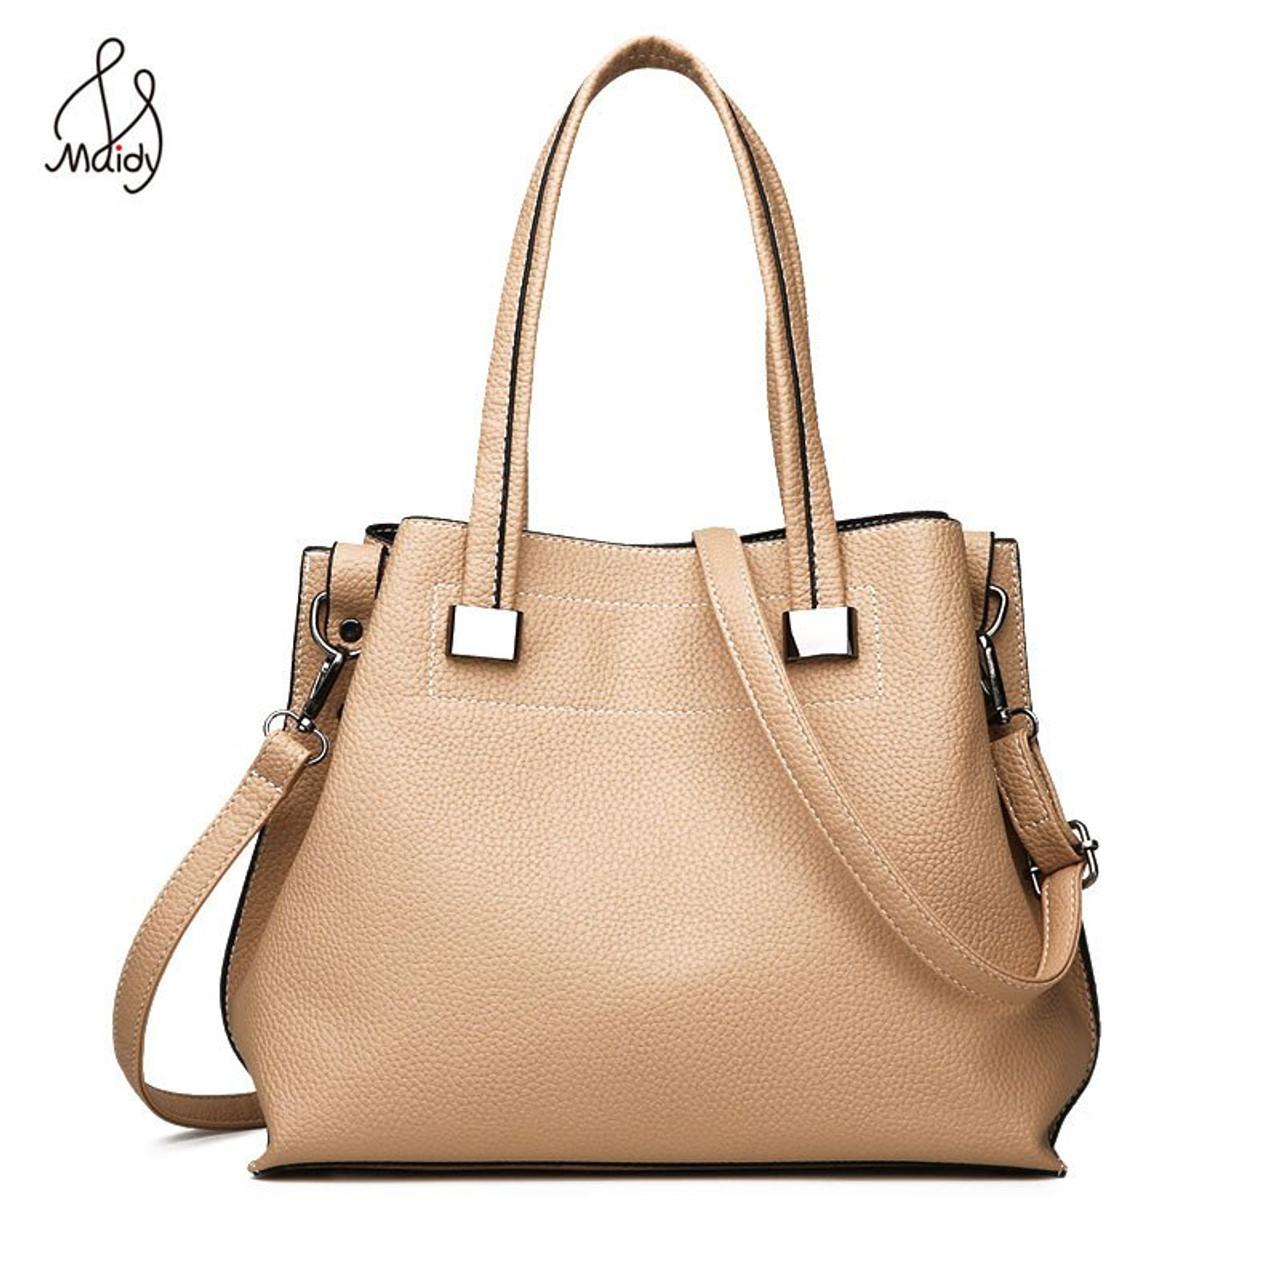 fa9f6bfc4b5d3 ... Luxury Handbags Women Bags Designer Lady Leather Large Soft Capacity  Casual Tote Shoulder Crossbody Messenger Brand ...